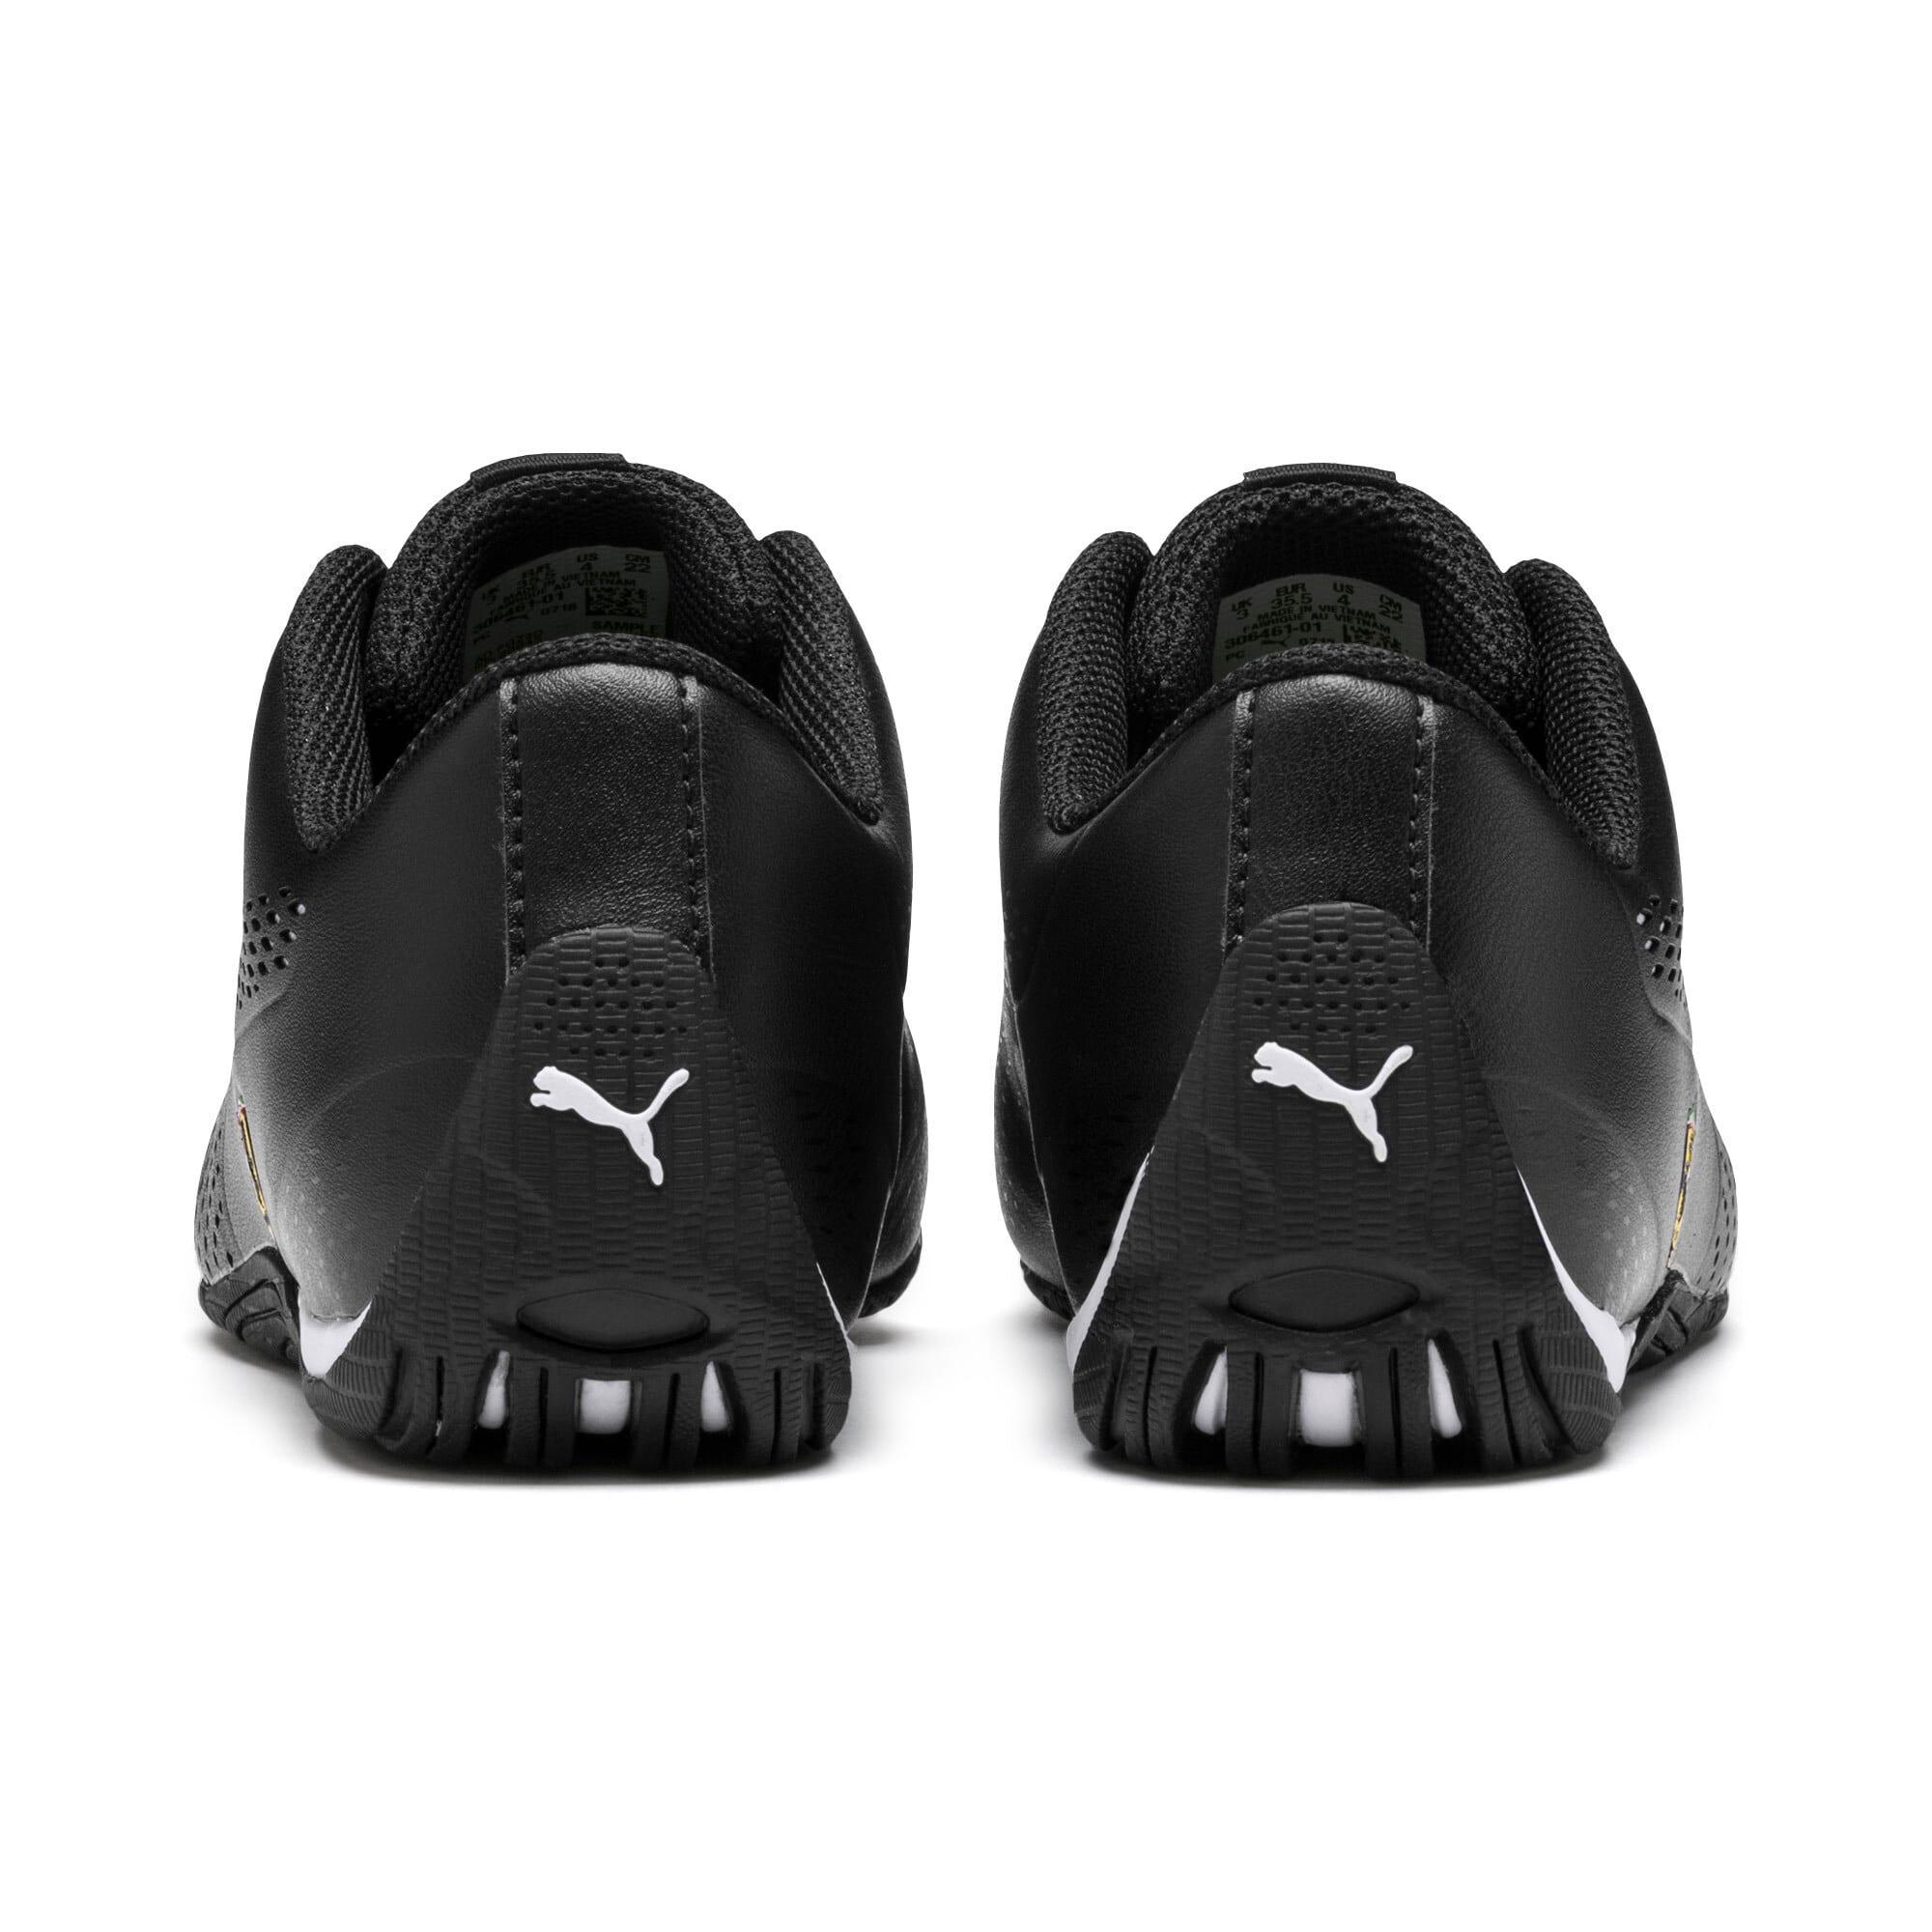 Thumbnail 3 of Scuderia Ferrari Drift Cat 5 Ultra II Shoes JR, Puma Black-Puma White, medium